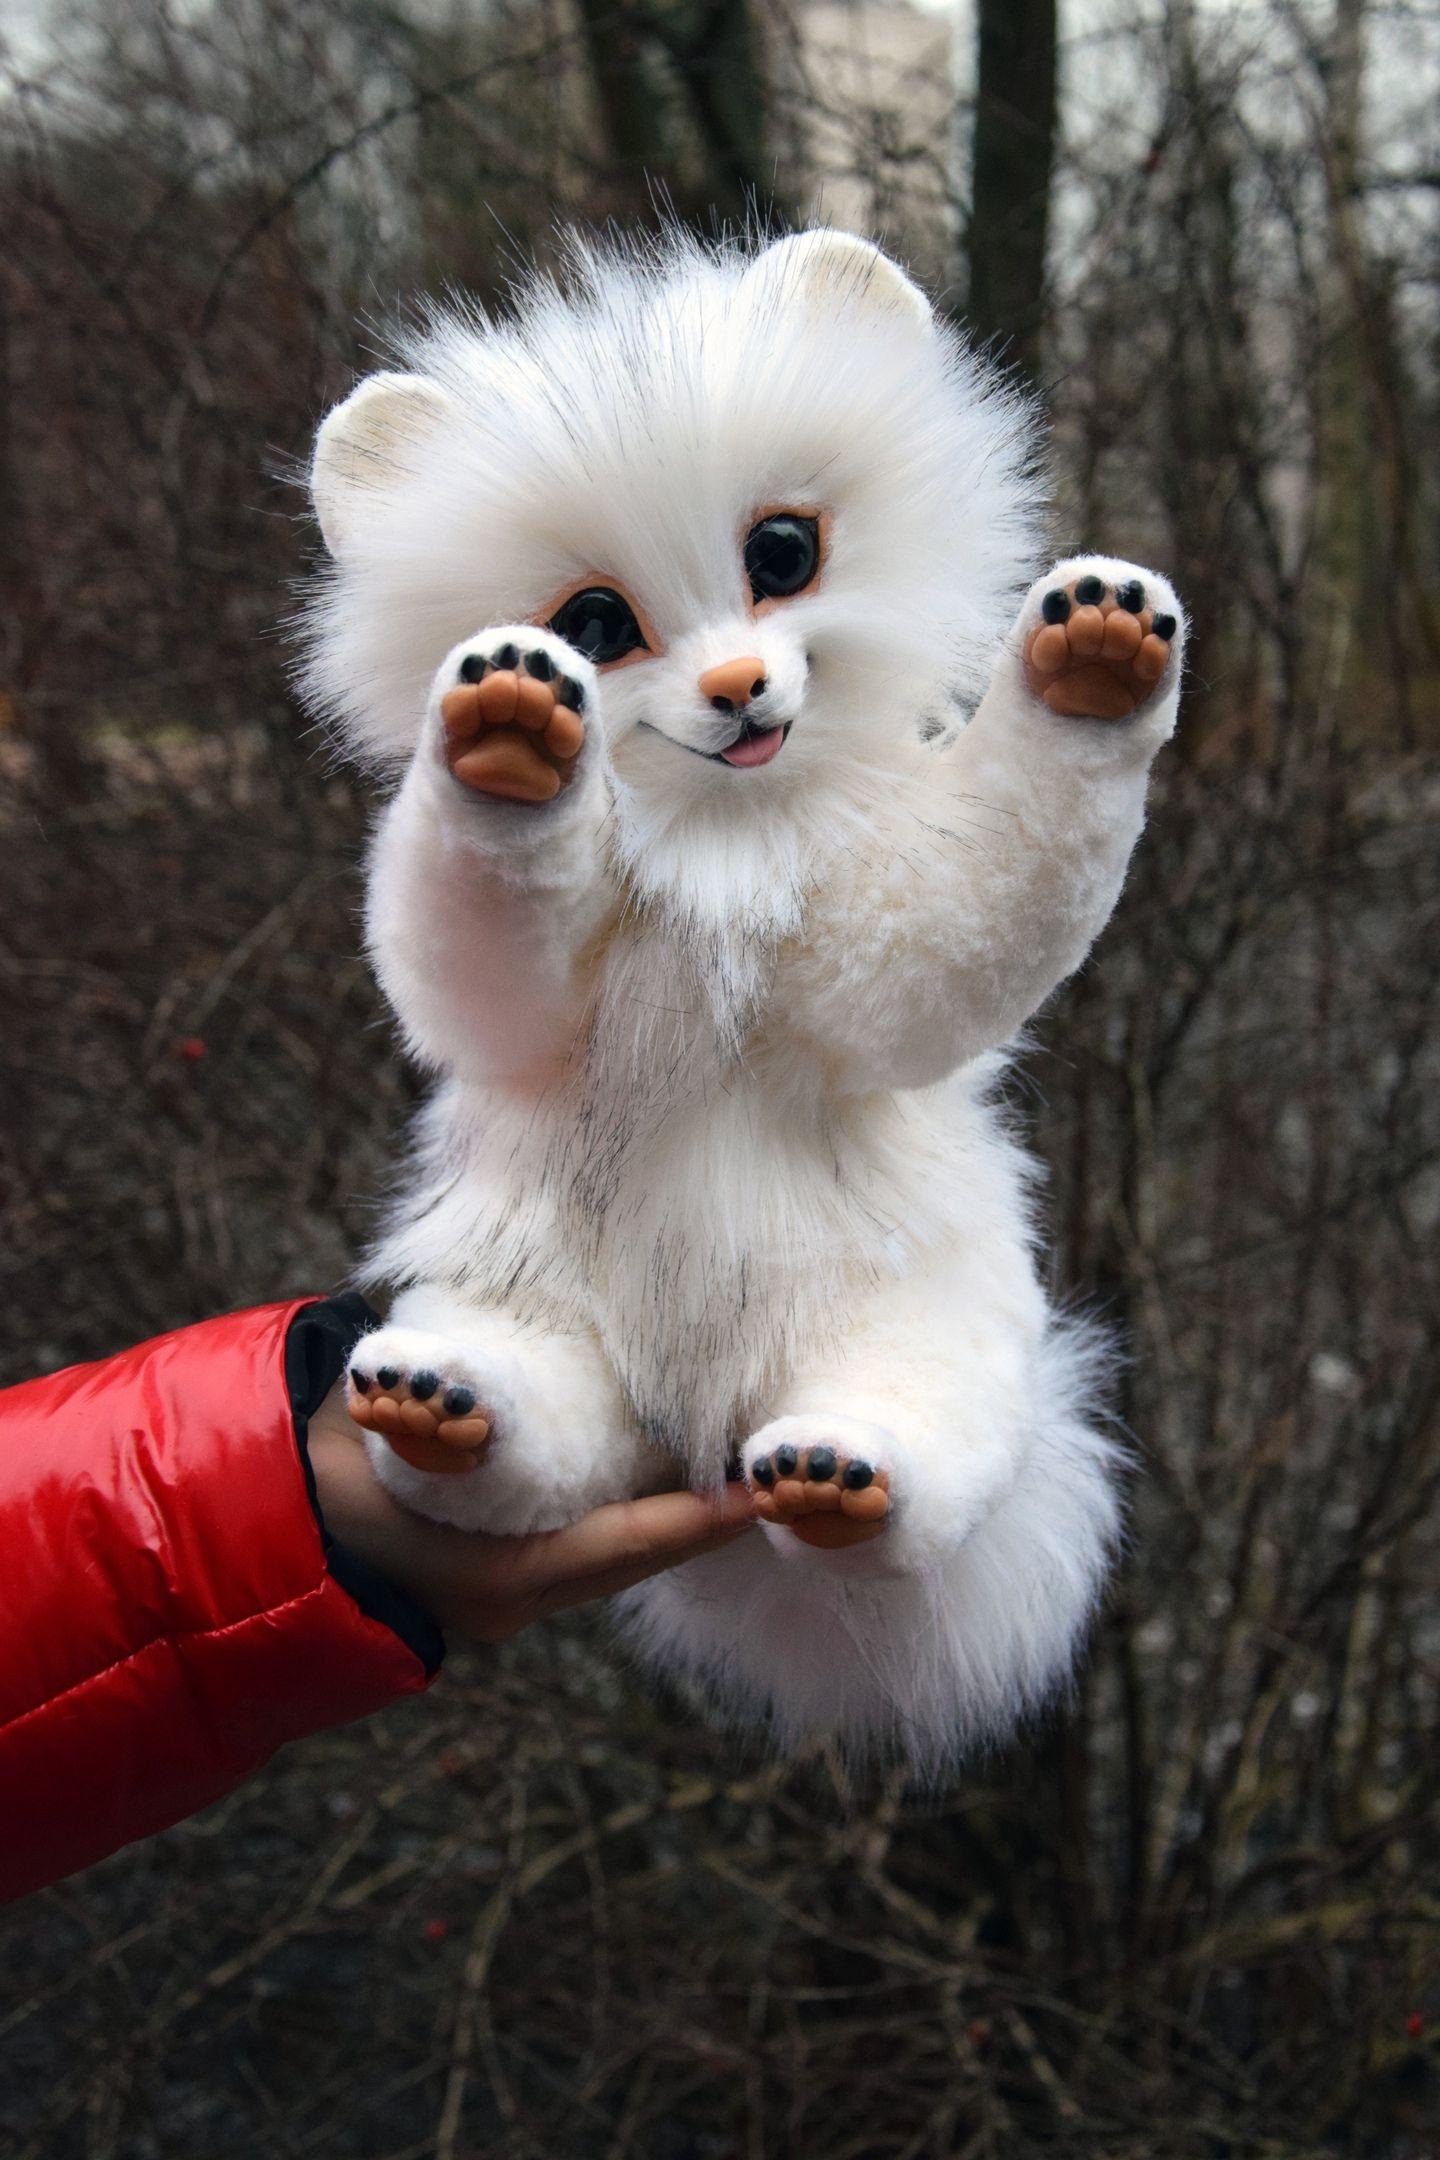 White Pomeranian Puppy Dog, Fantasy creatures & pets toys